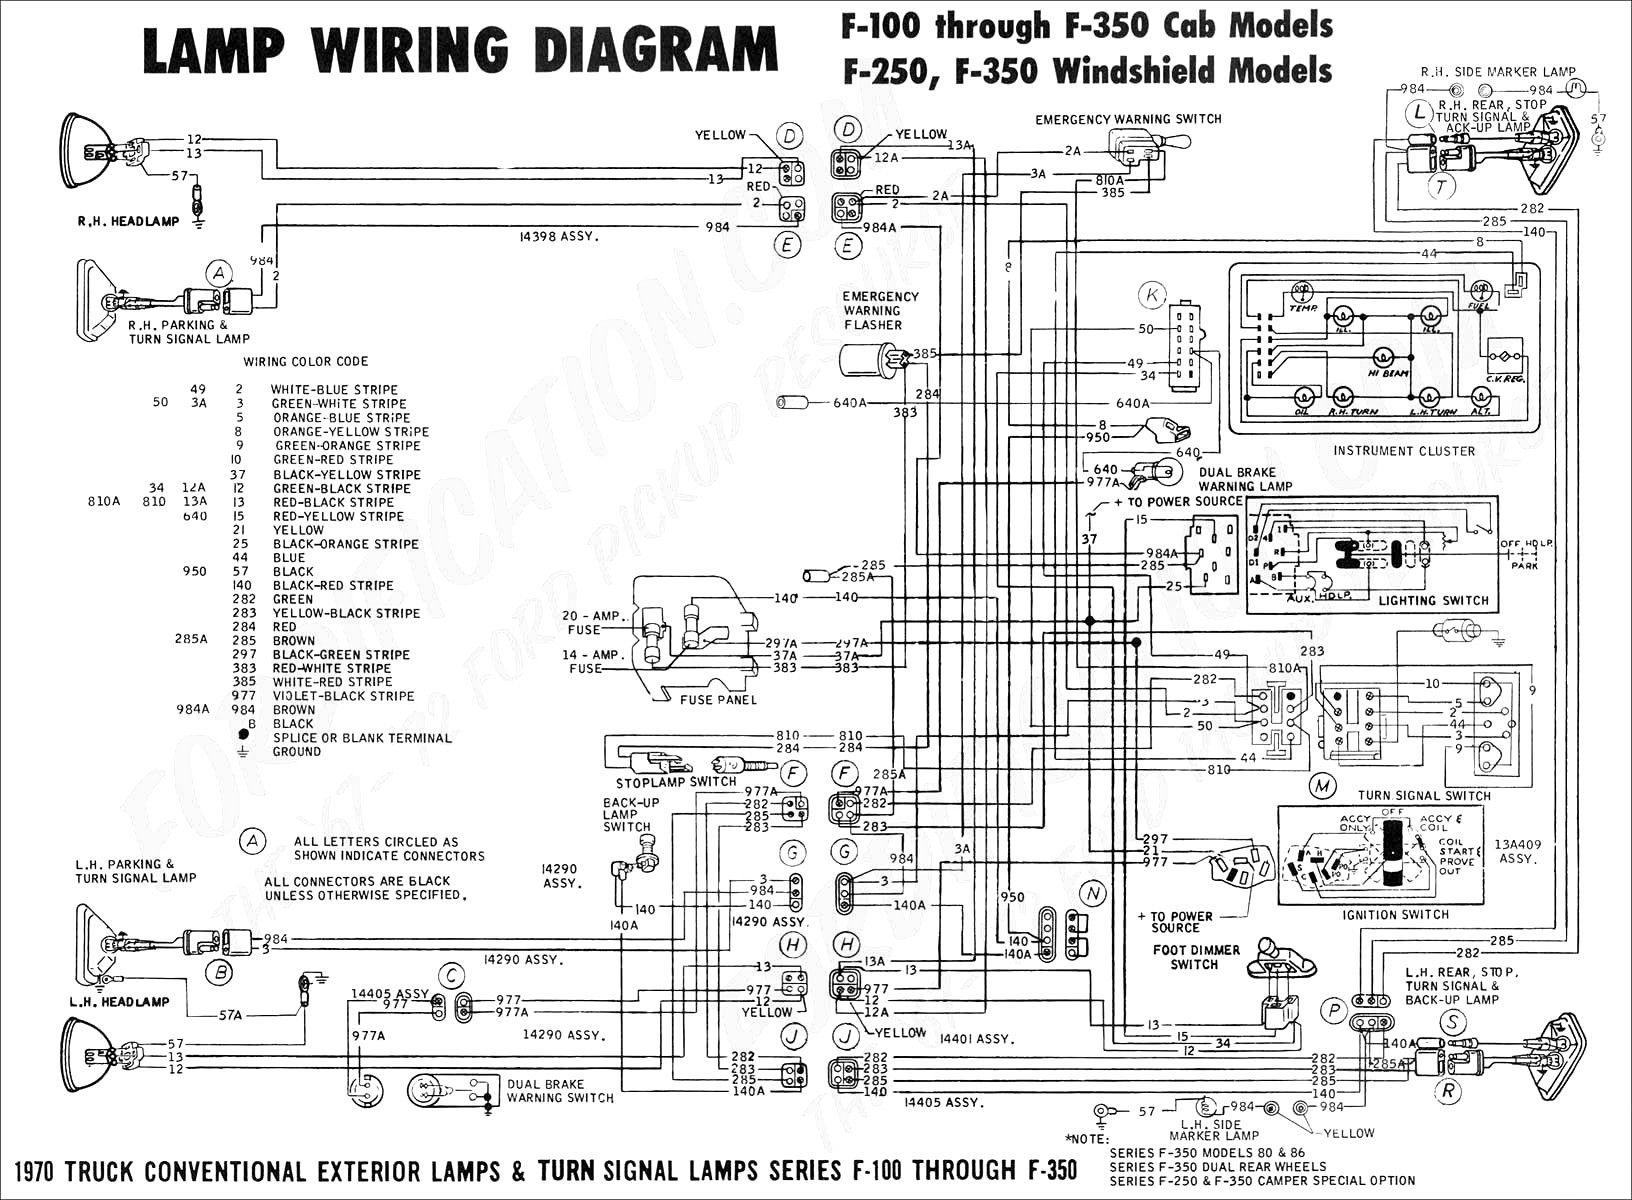 Ford Plug Wiring Diagram | Wiring Diagram - 2001 Ford Mustang Spark Plug Wiring Diagram